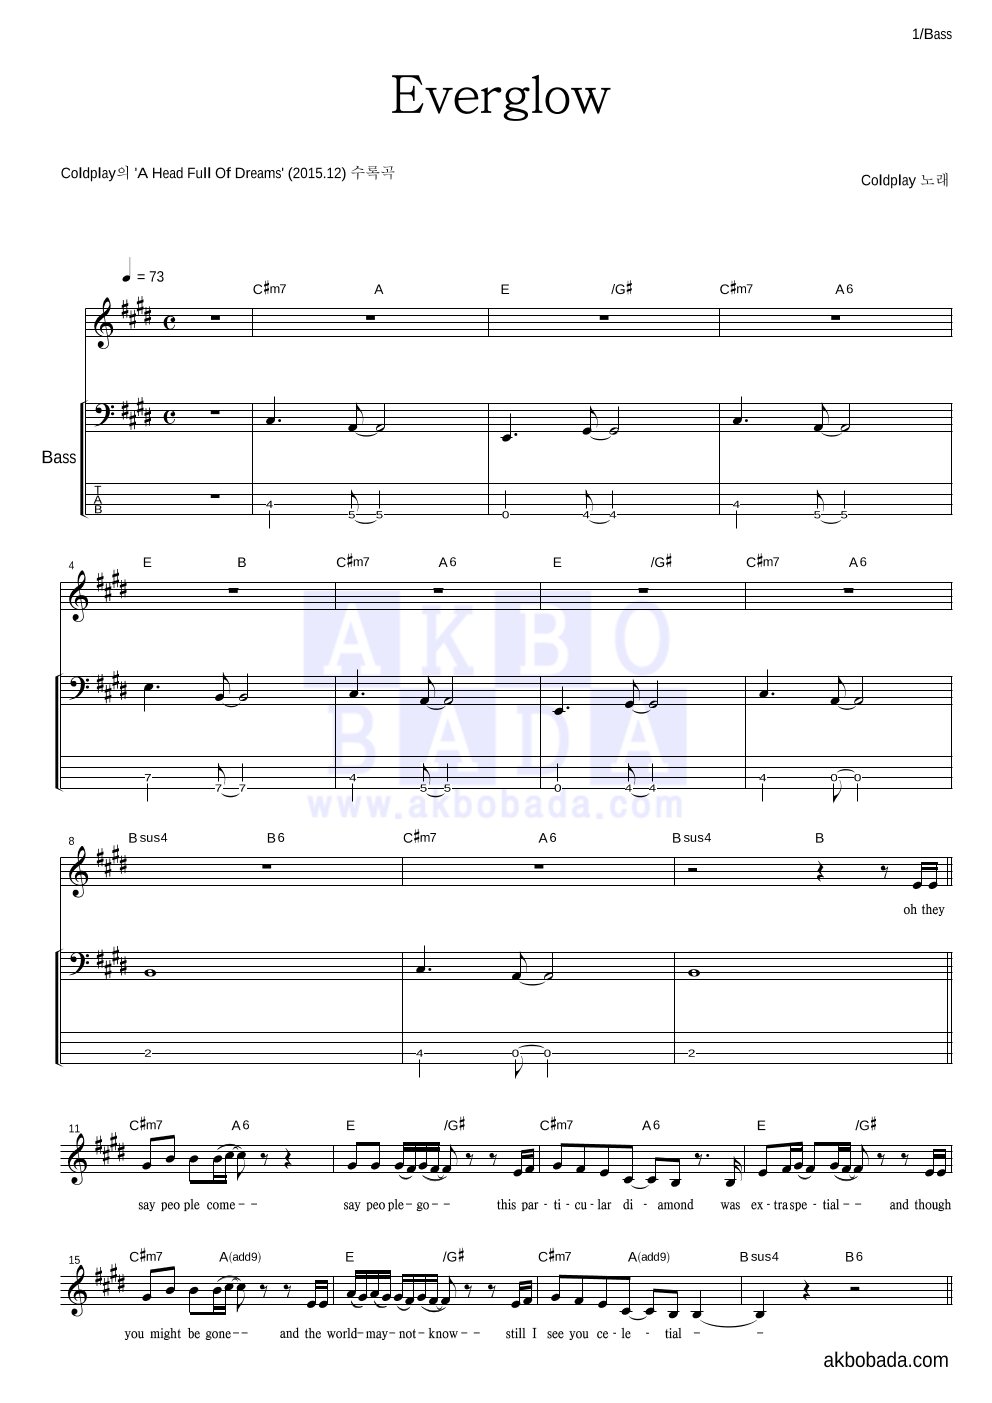 Coldplay - Everglow 베이스 악보